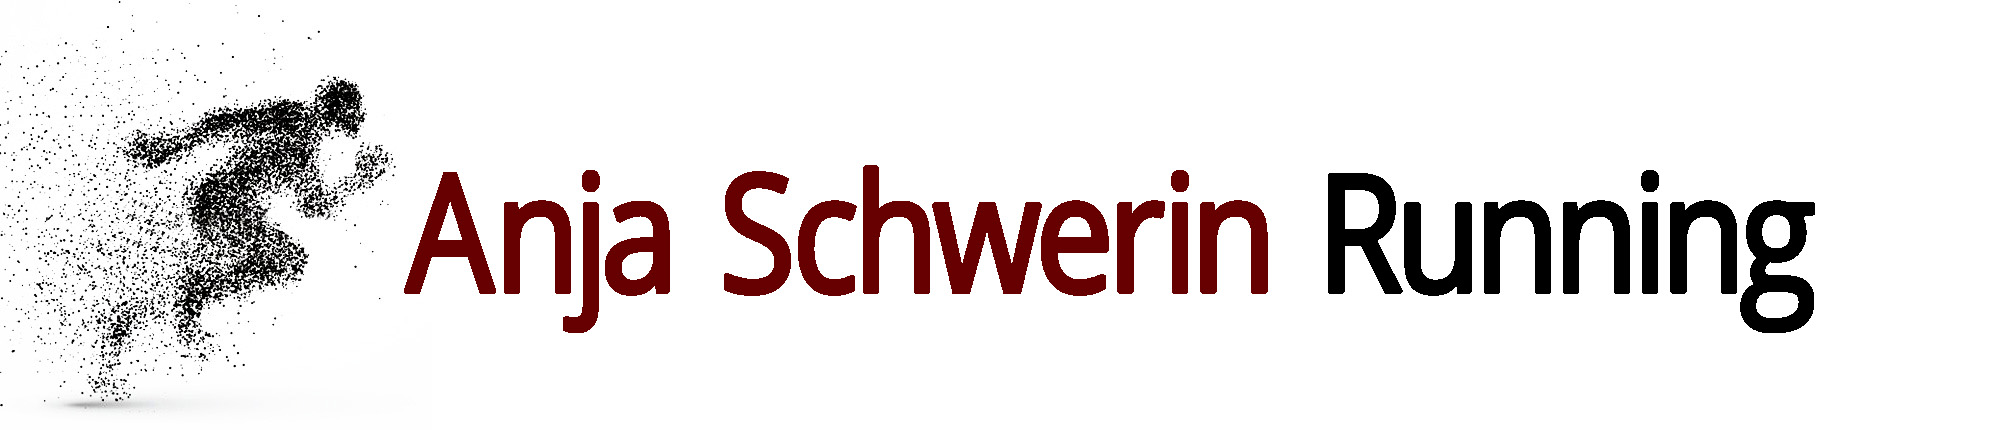 Anja Schwerin Running